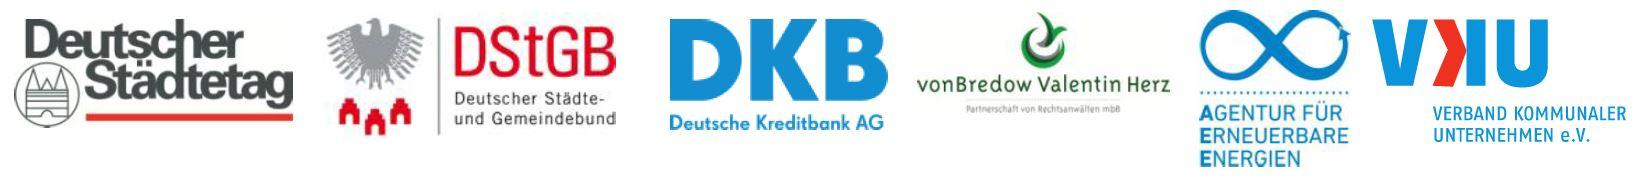 AEE, Städtetag, VKU, etc. - logos